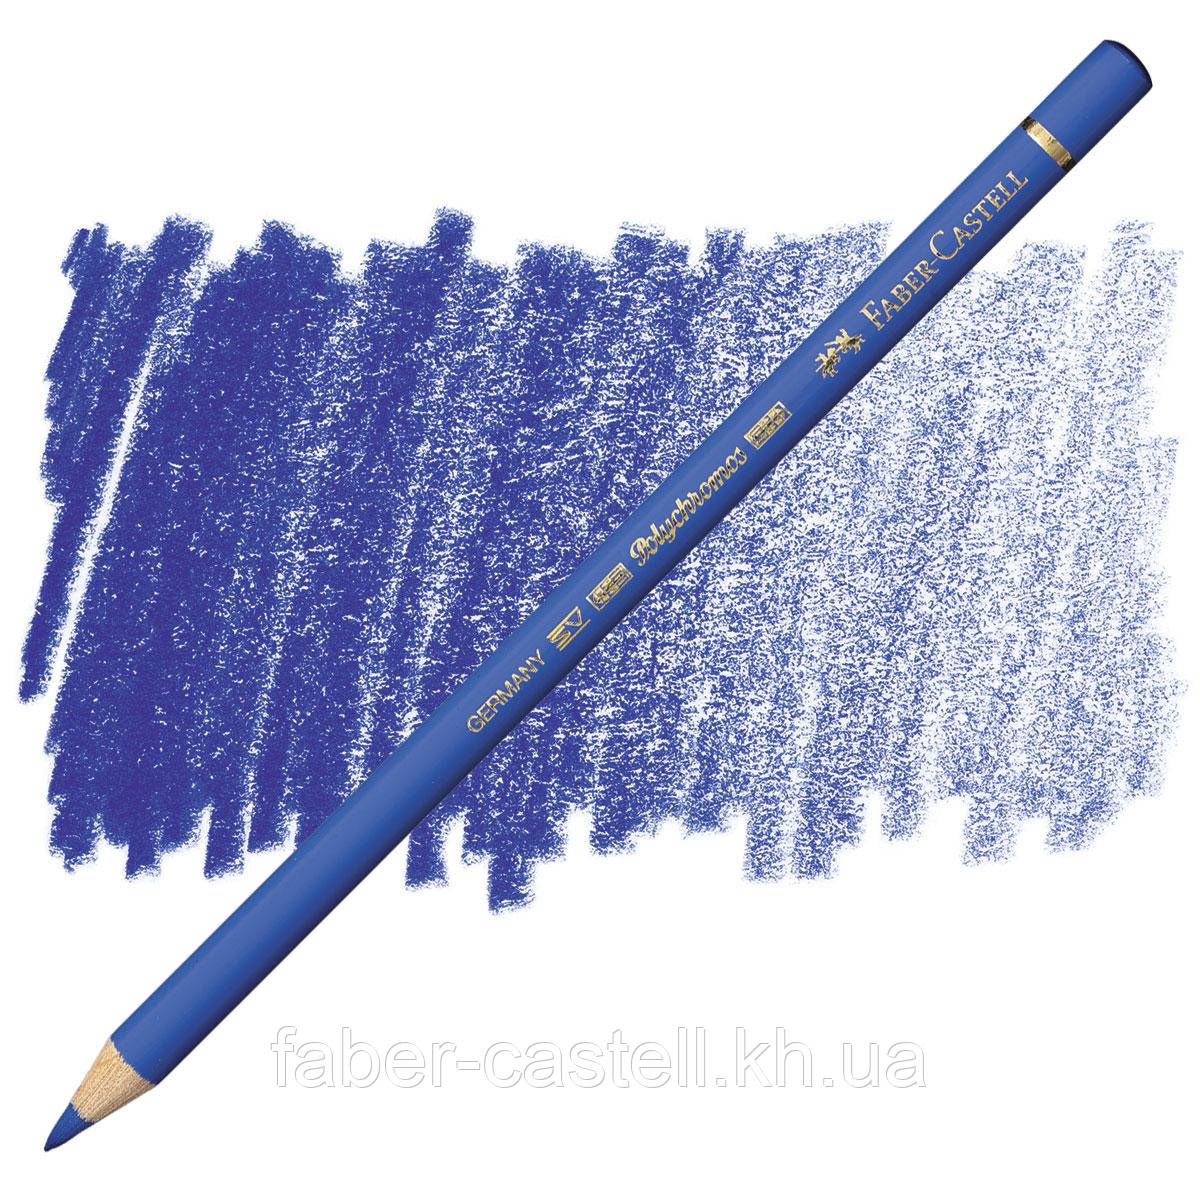 Карандаш цветной Faber-Castell POLYCHROMOS ультрамарин №120 (Ultramarine), 110120